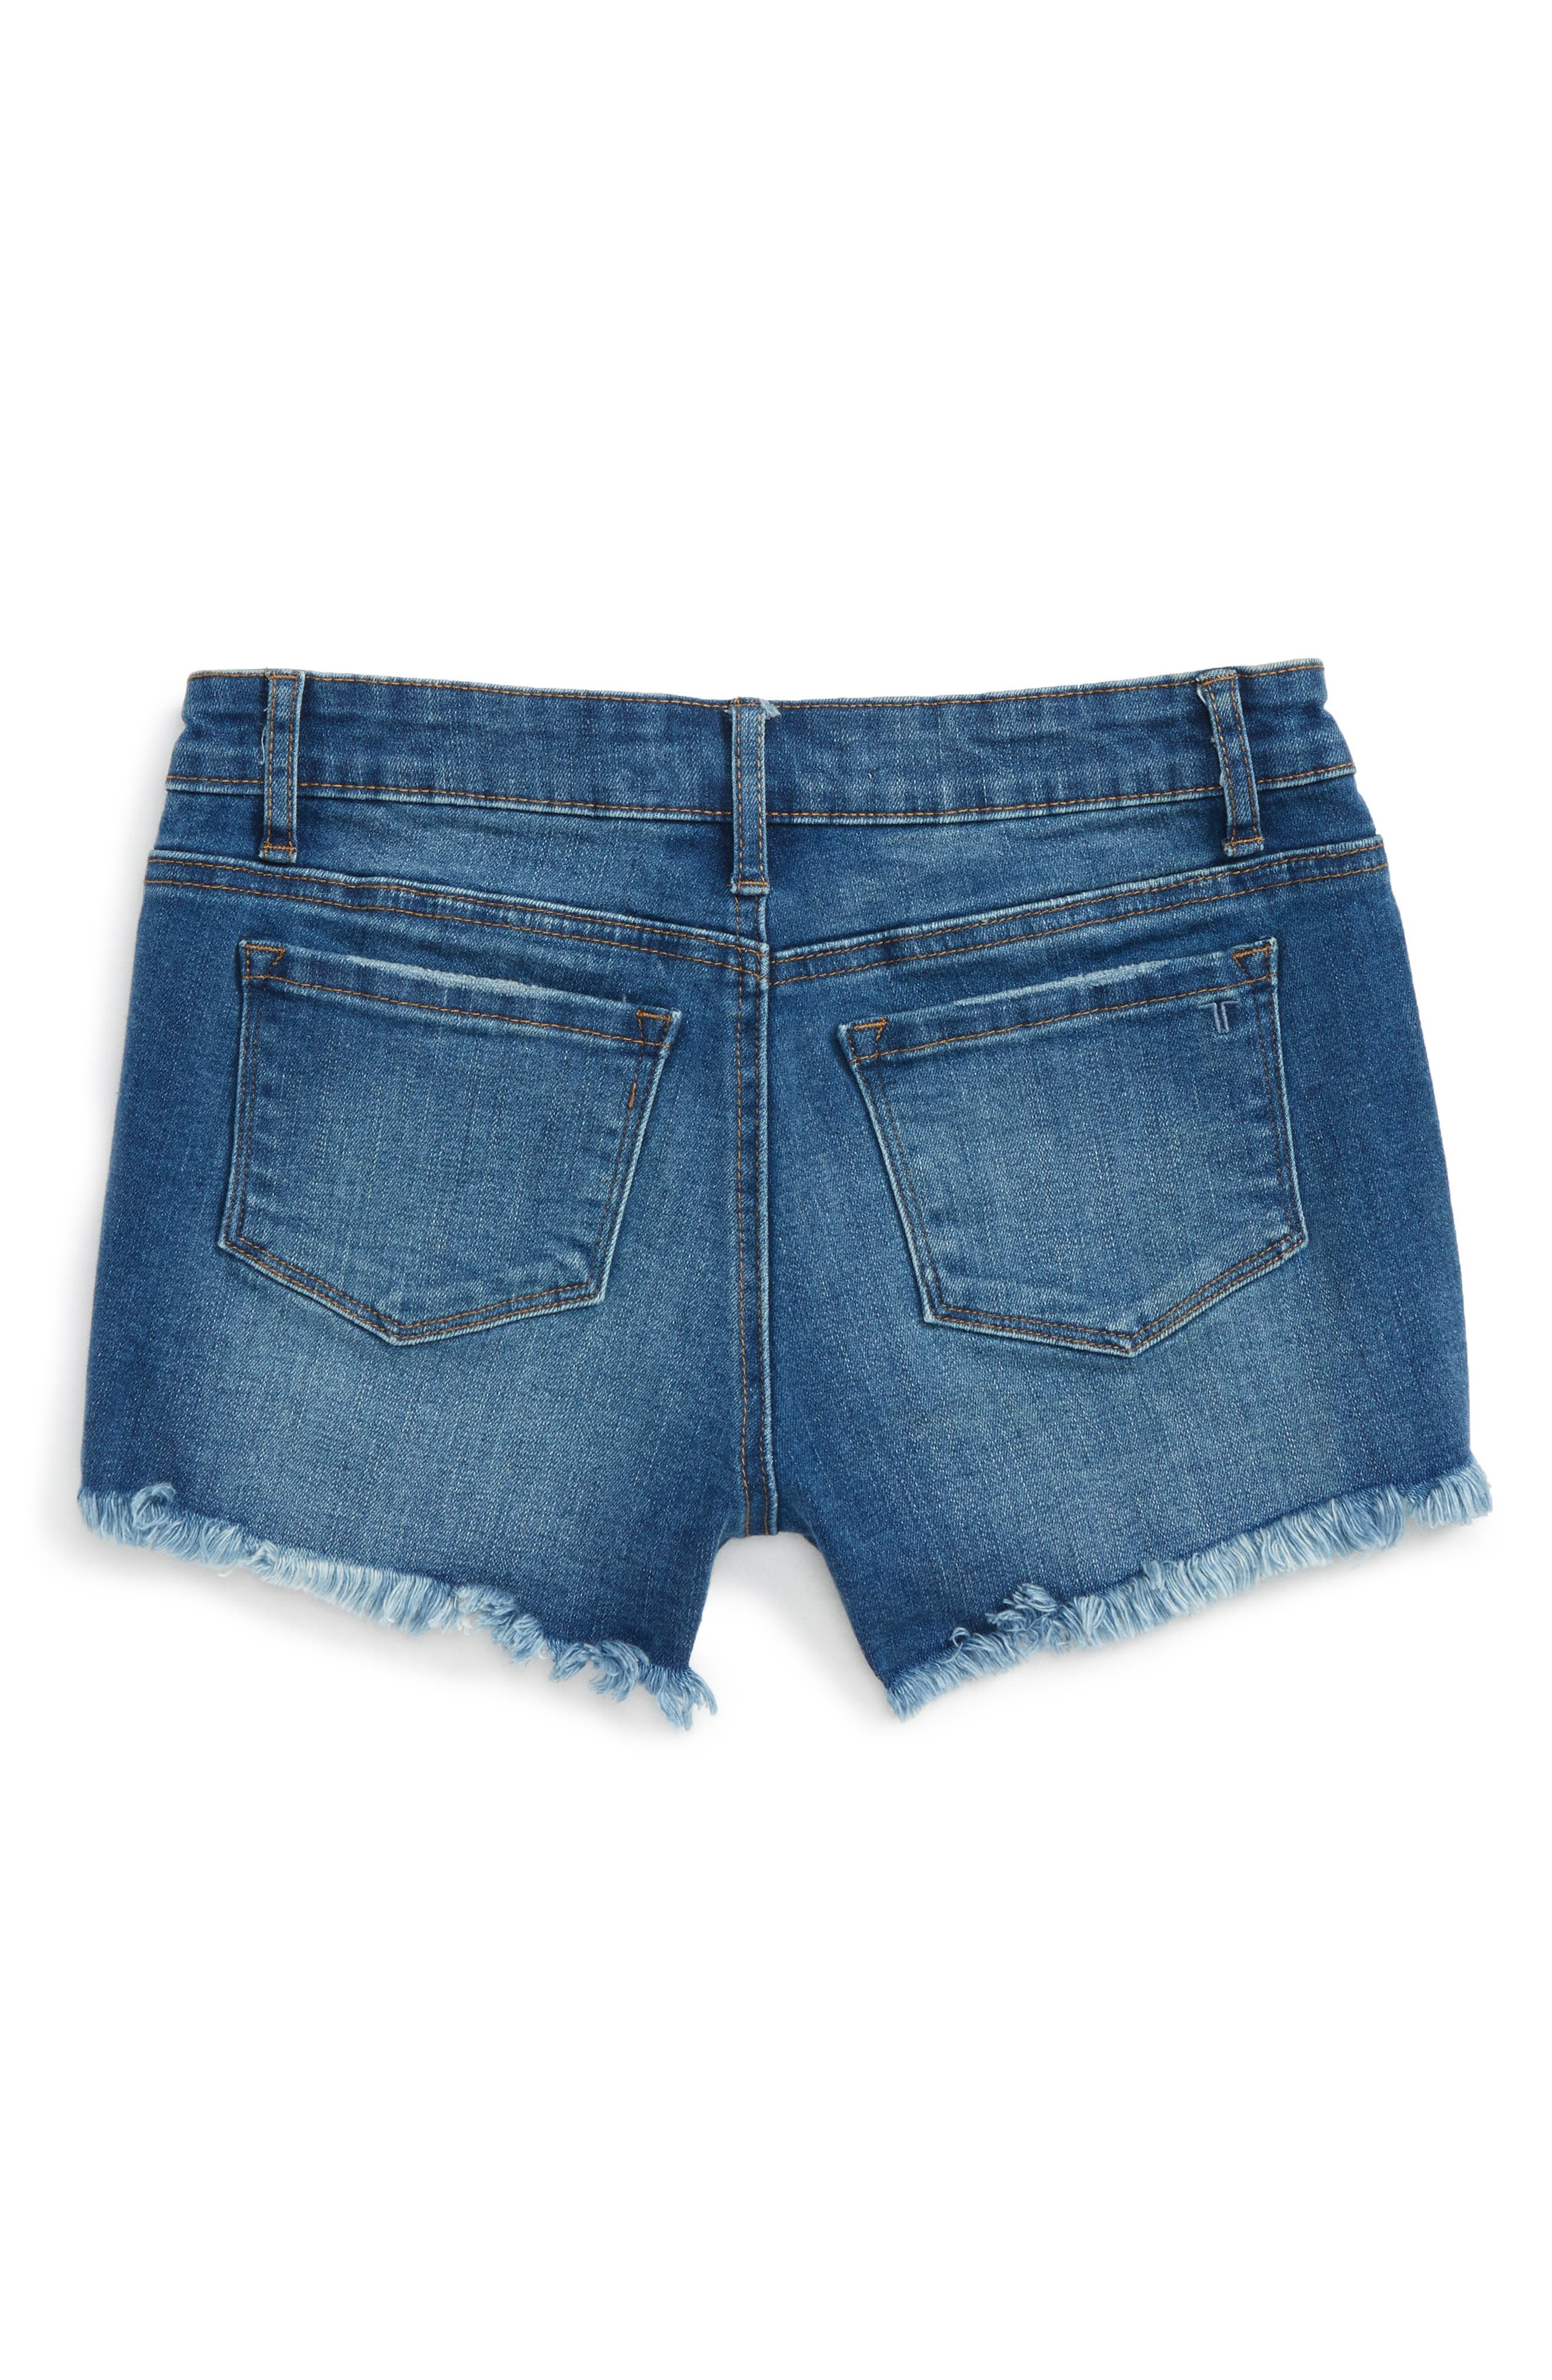 Alternate Image 2  - Tractr Distressed Cutoff Denim Shorts (Big Girls)